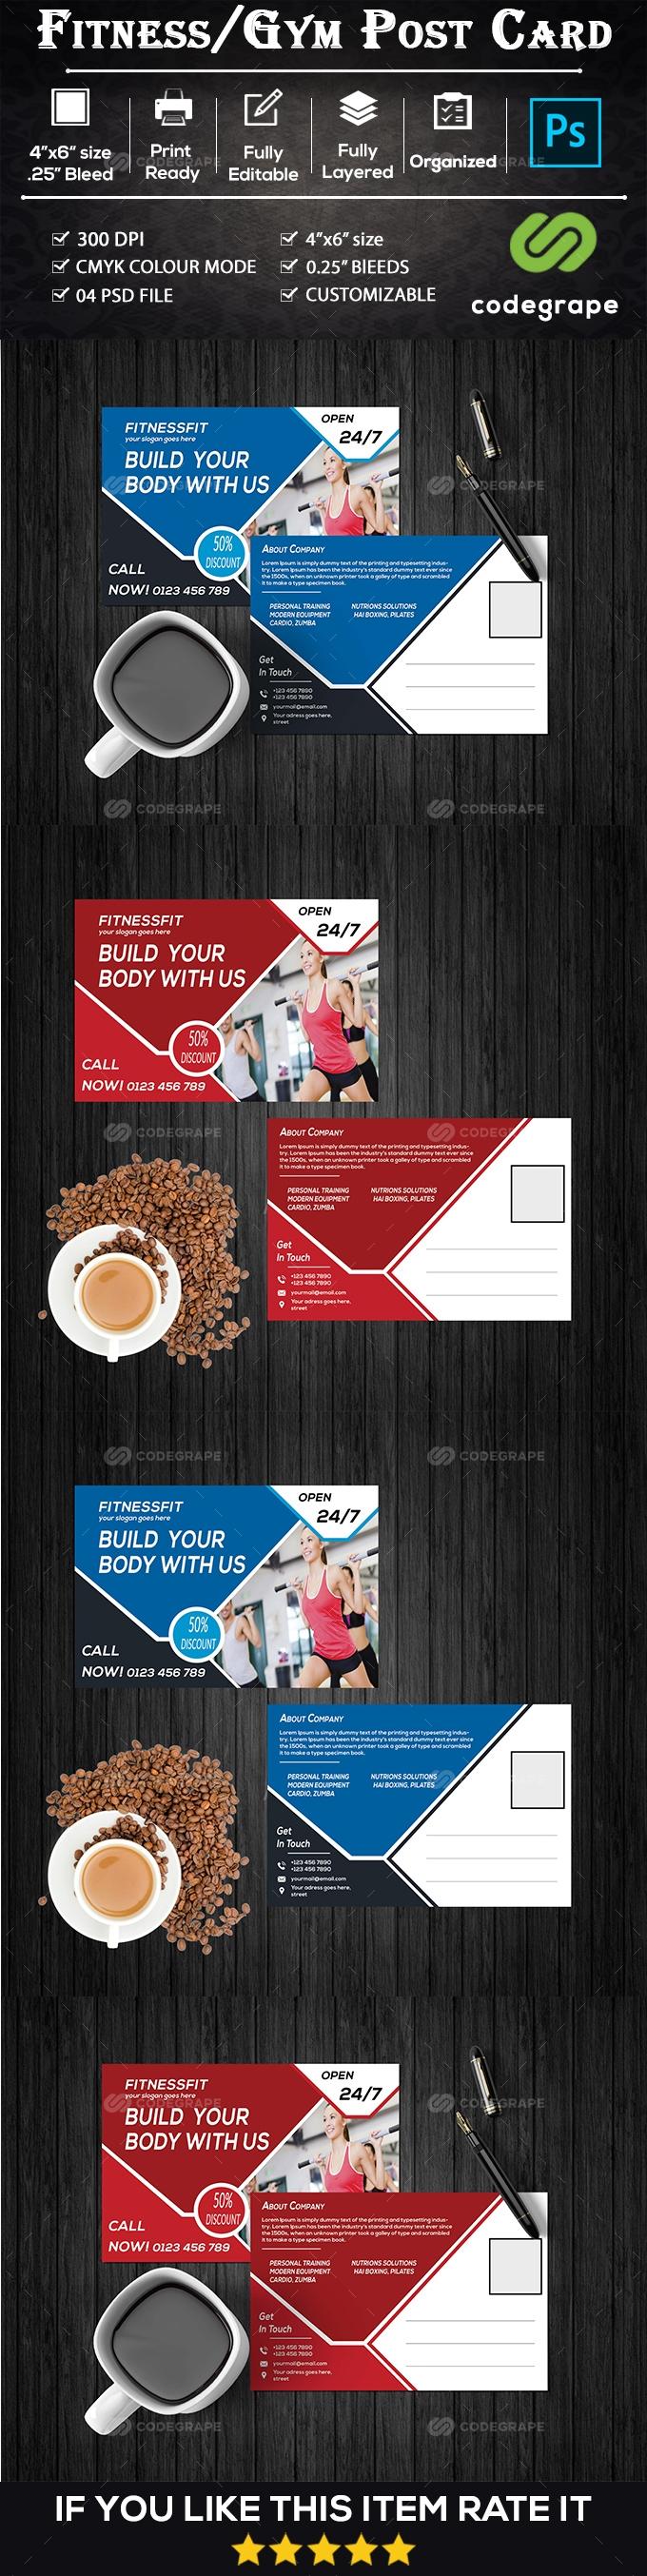 Fitness/Gym Postcard